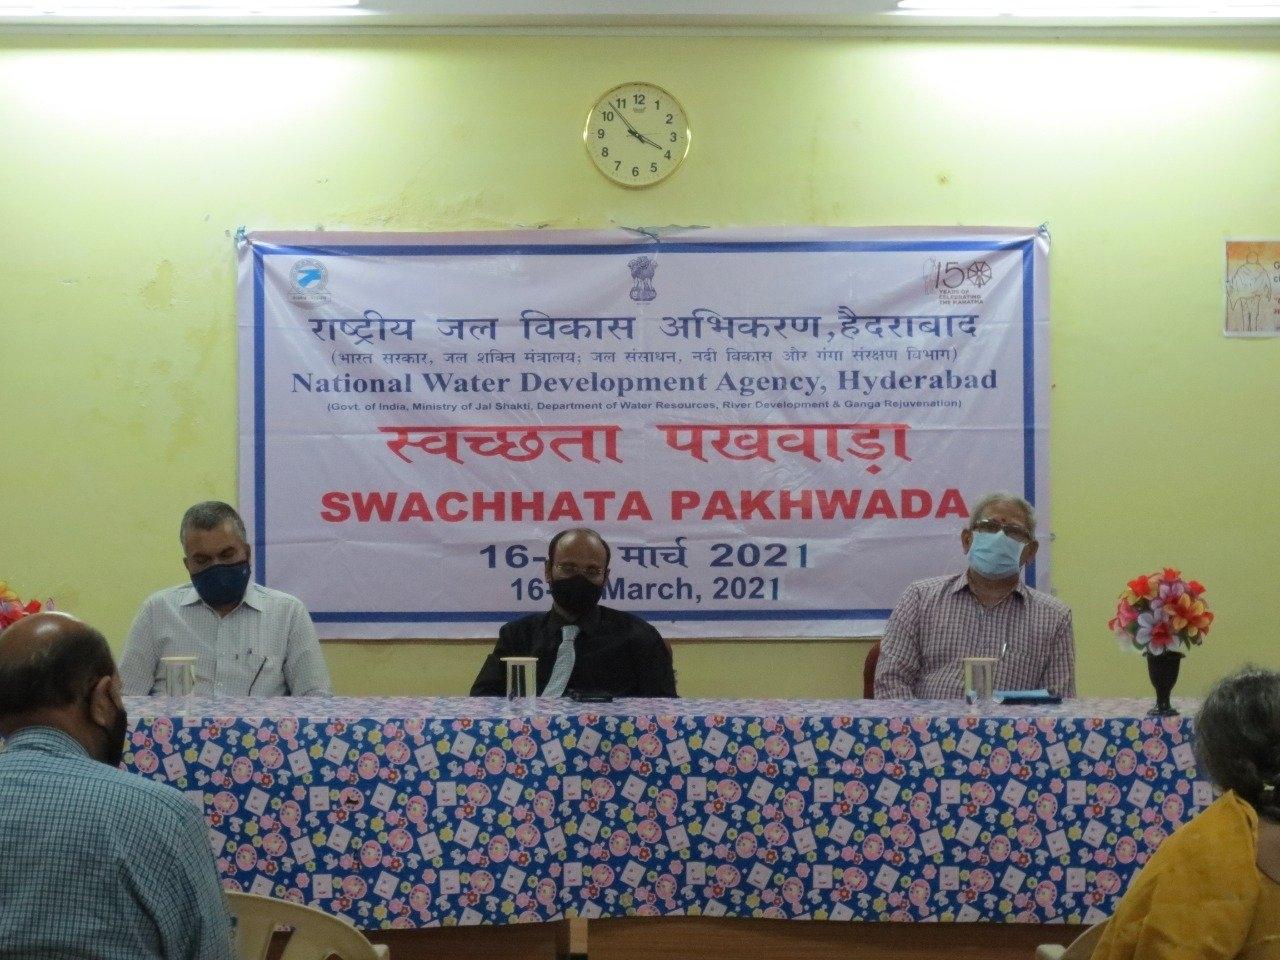 Celebration of Swachhata Pakhwada 2021 in NWDA photo 1